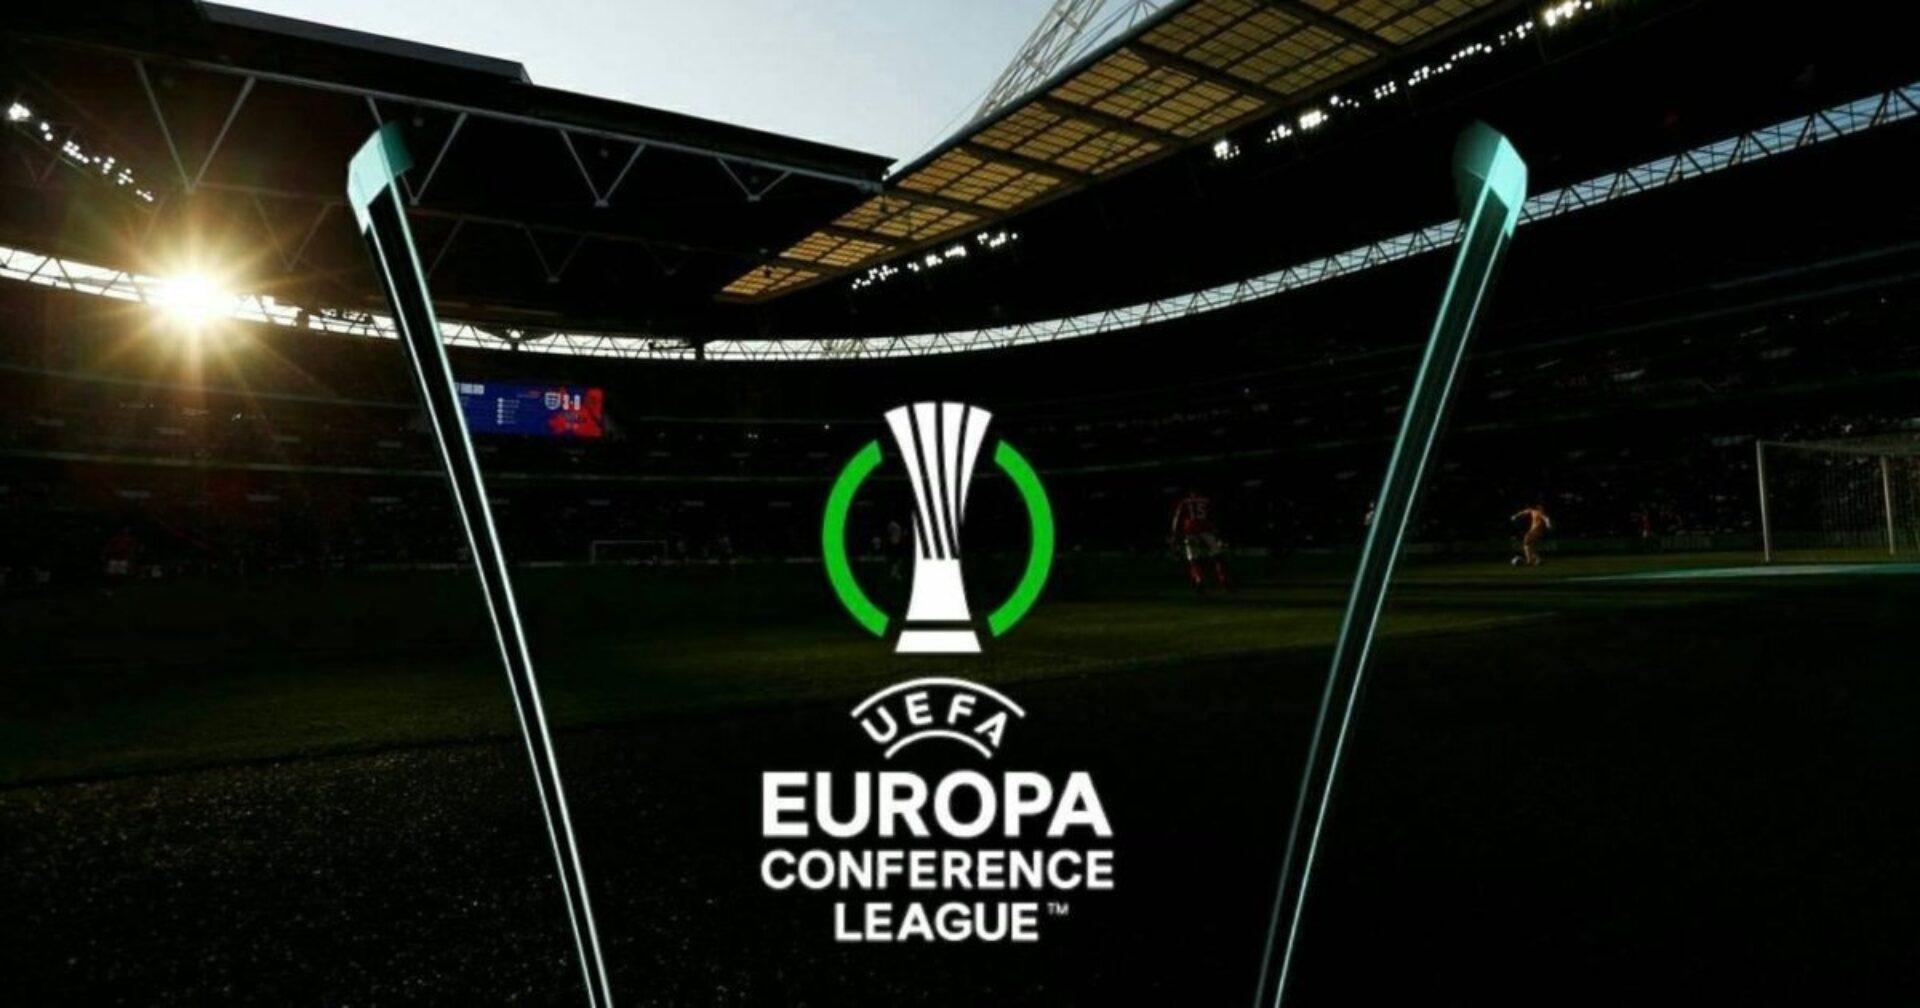 Europa Conference League 1